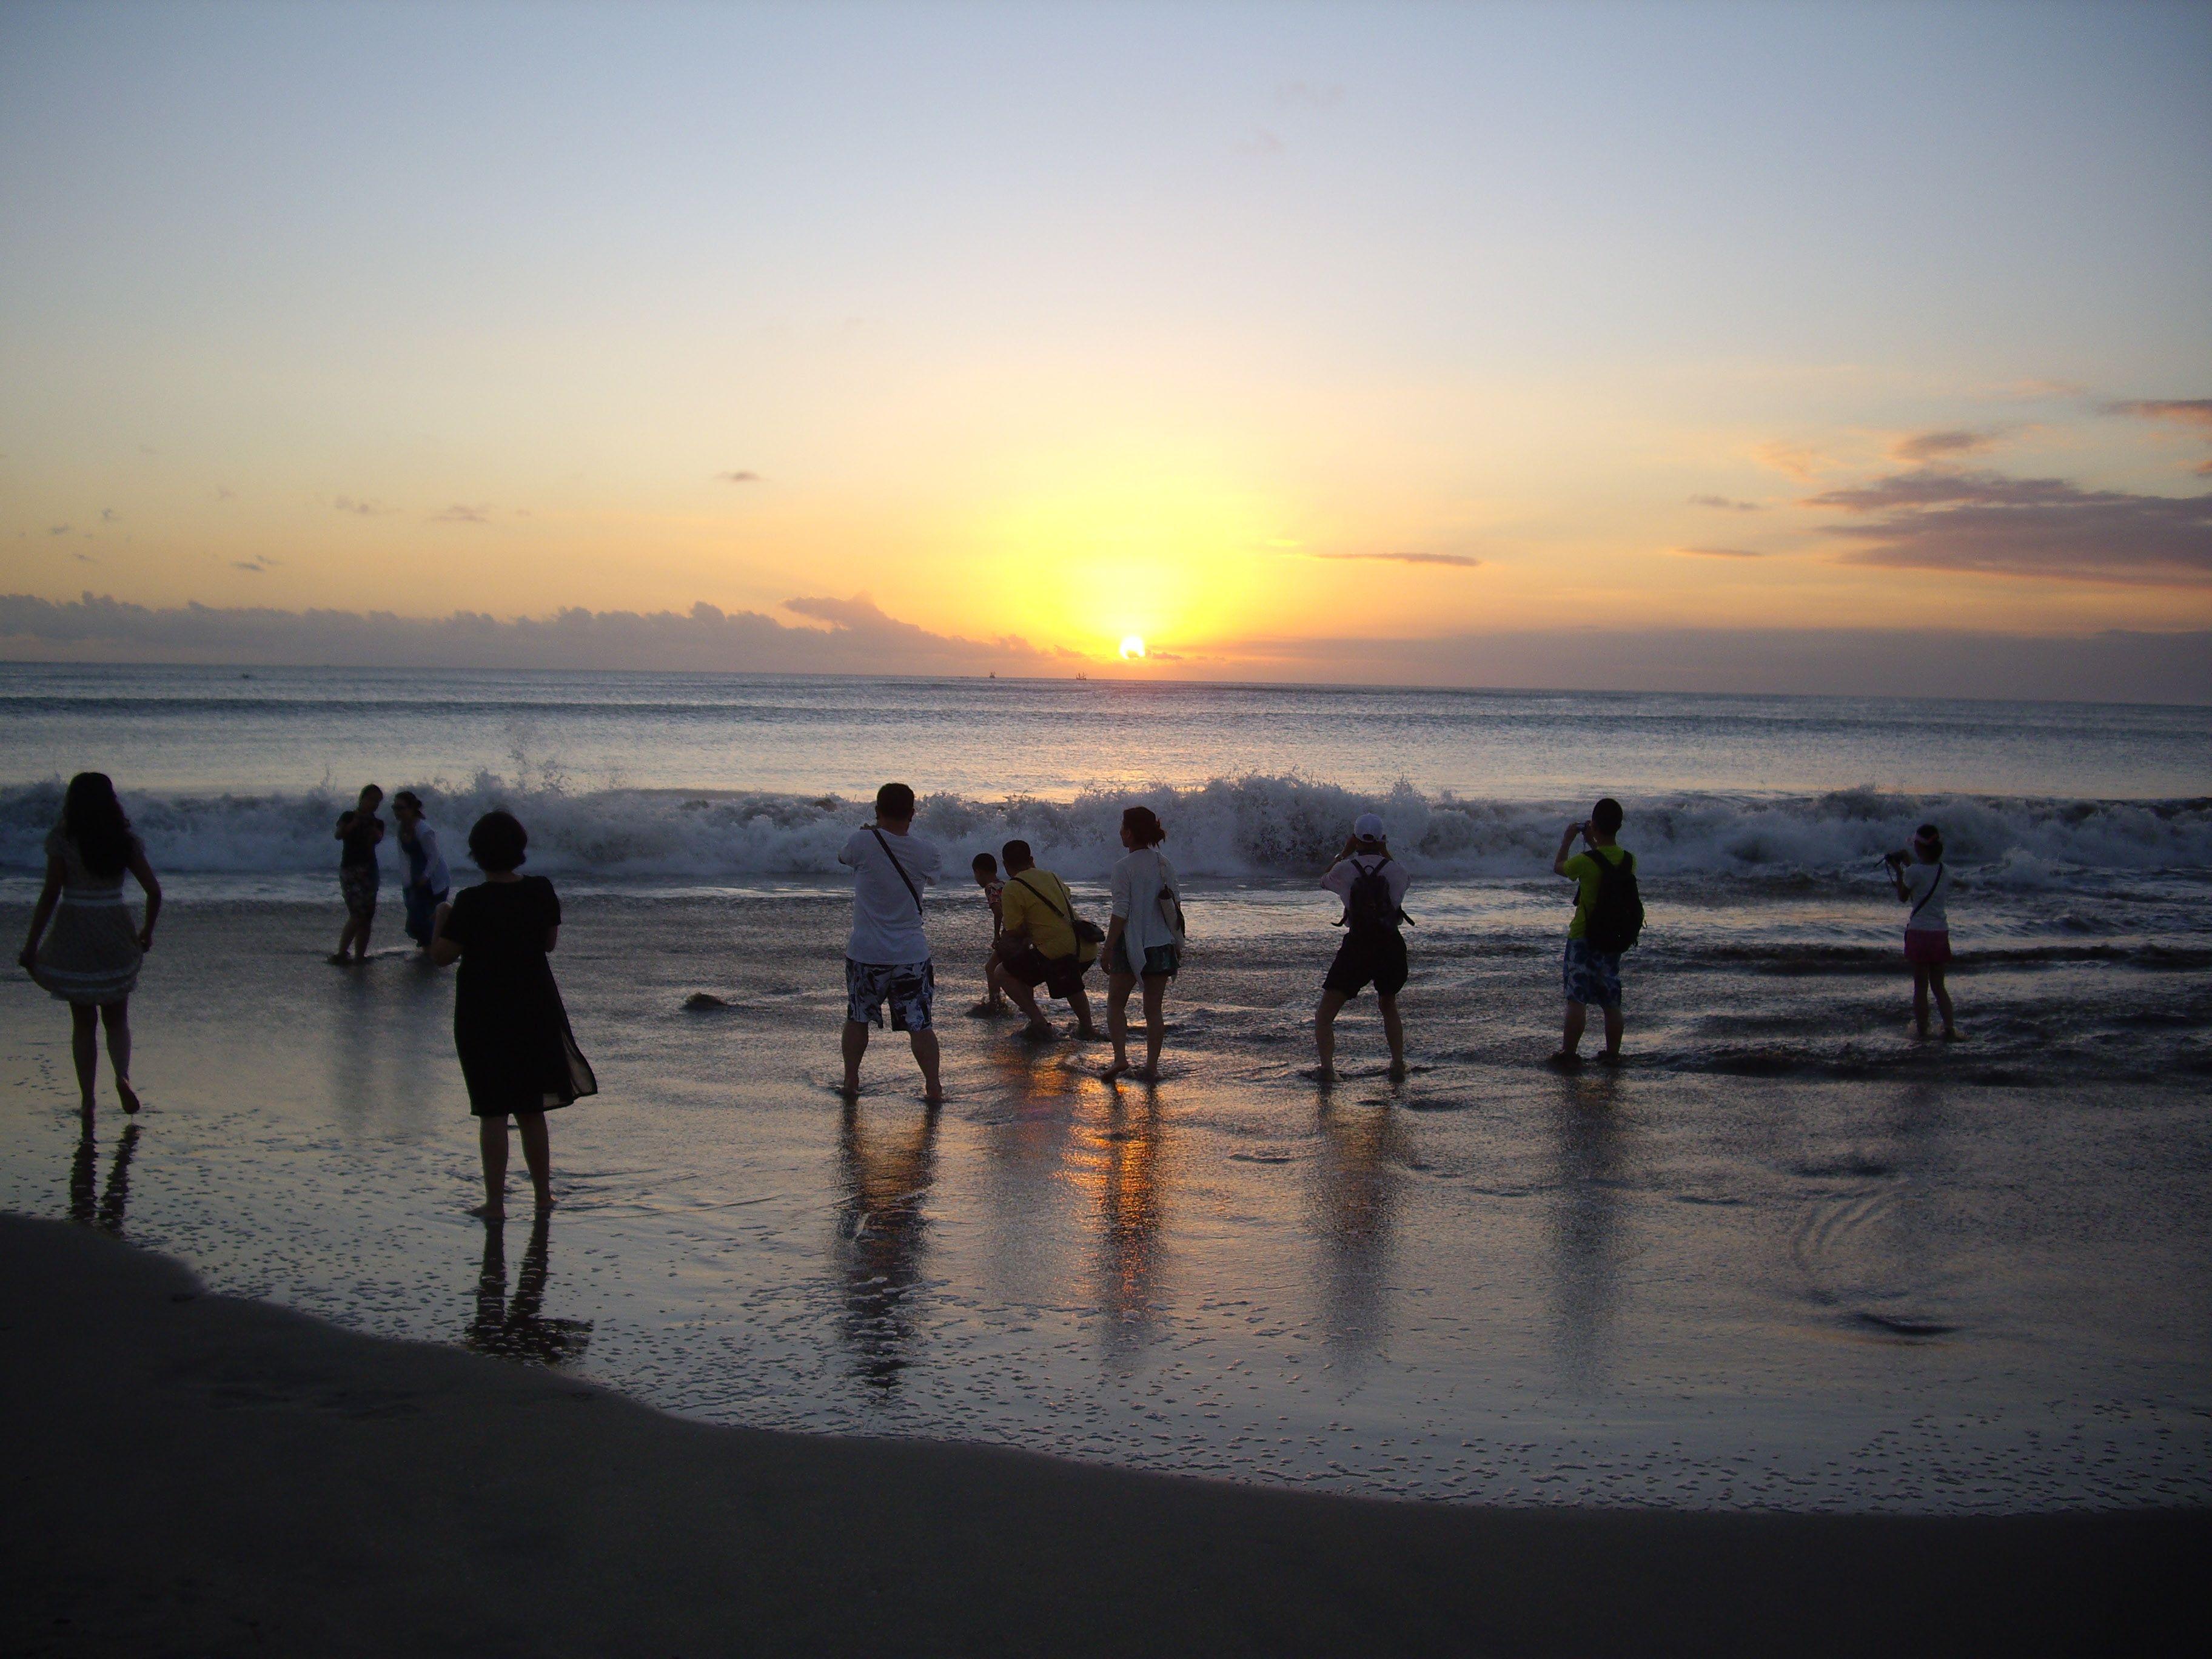 sunset at Jimbaran in Bali